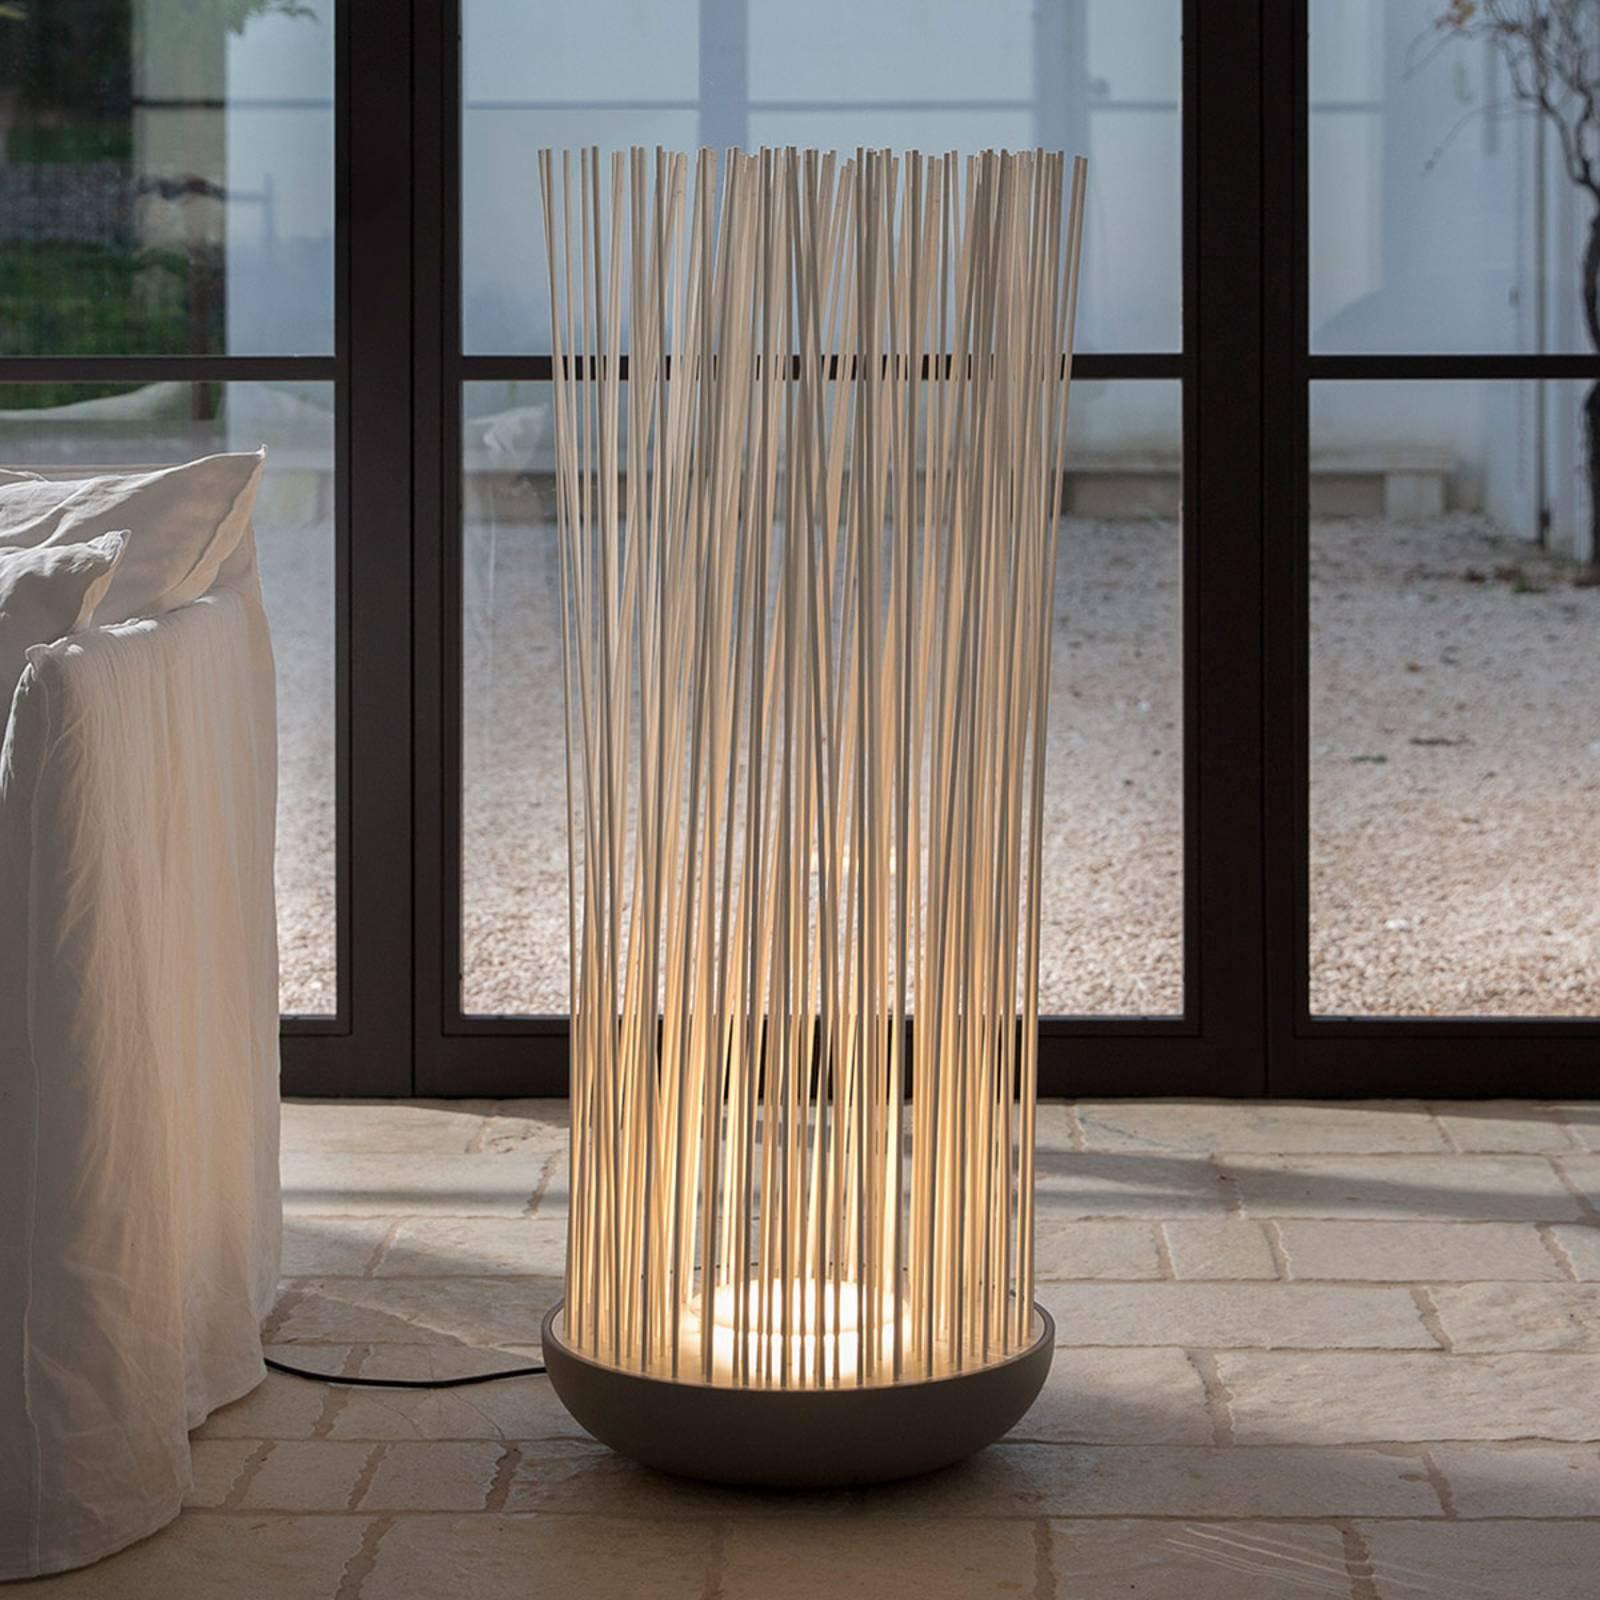 Karman Don't Touch - LED-gulvlampe, 3 000 K